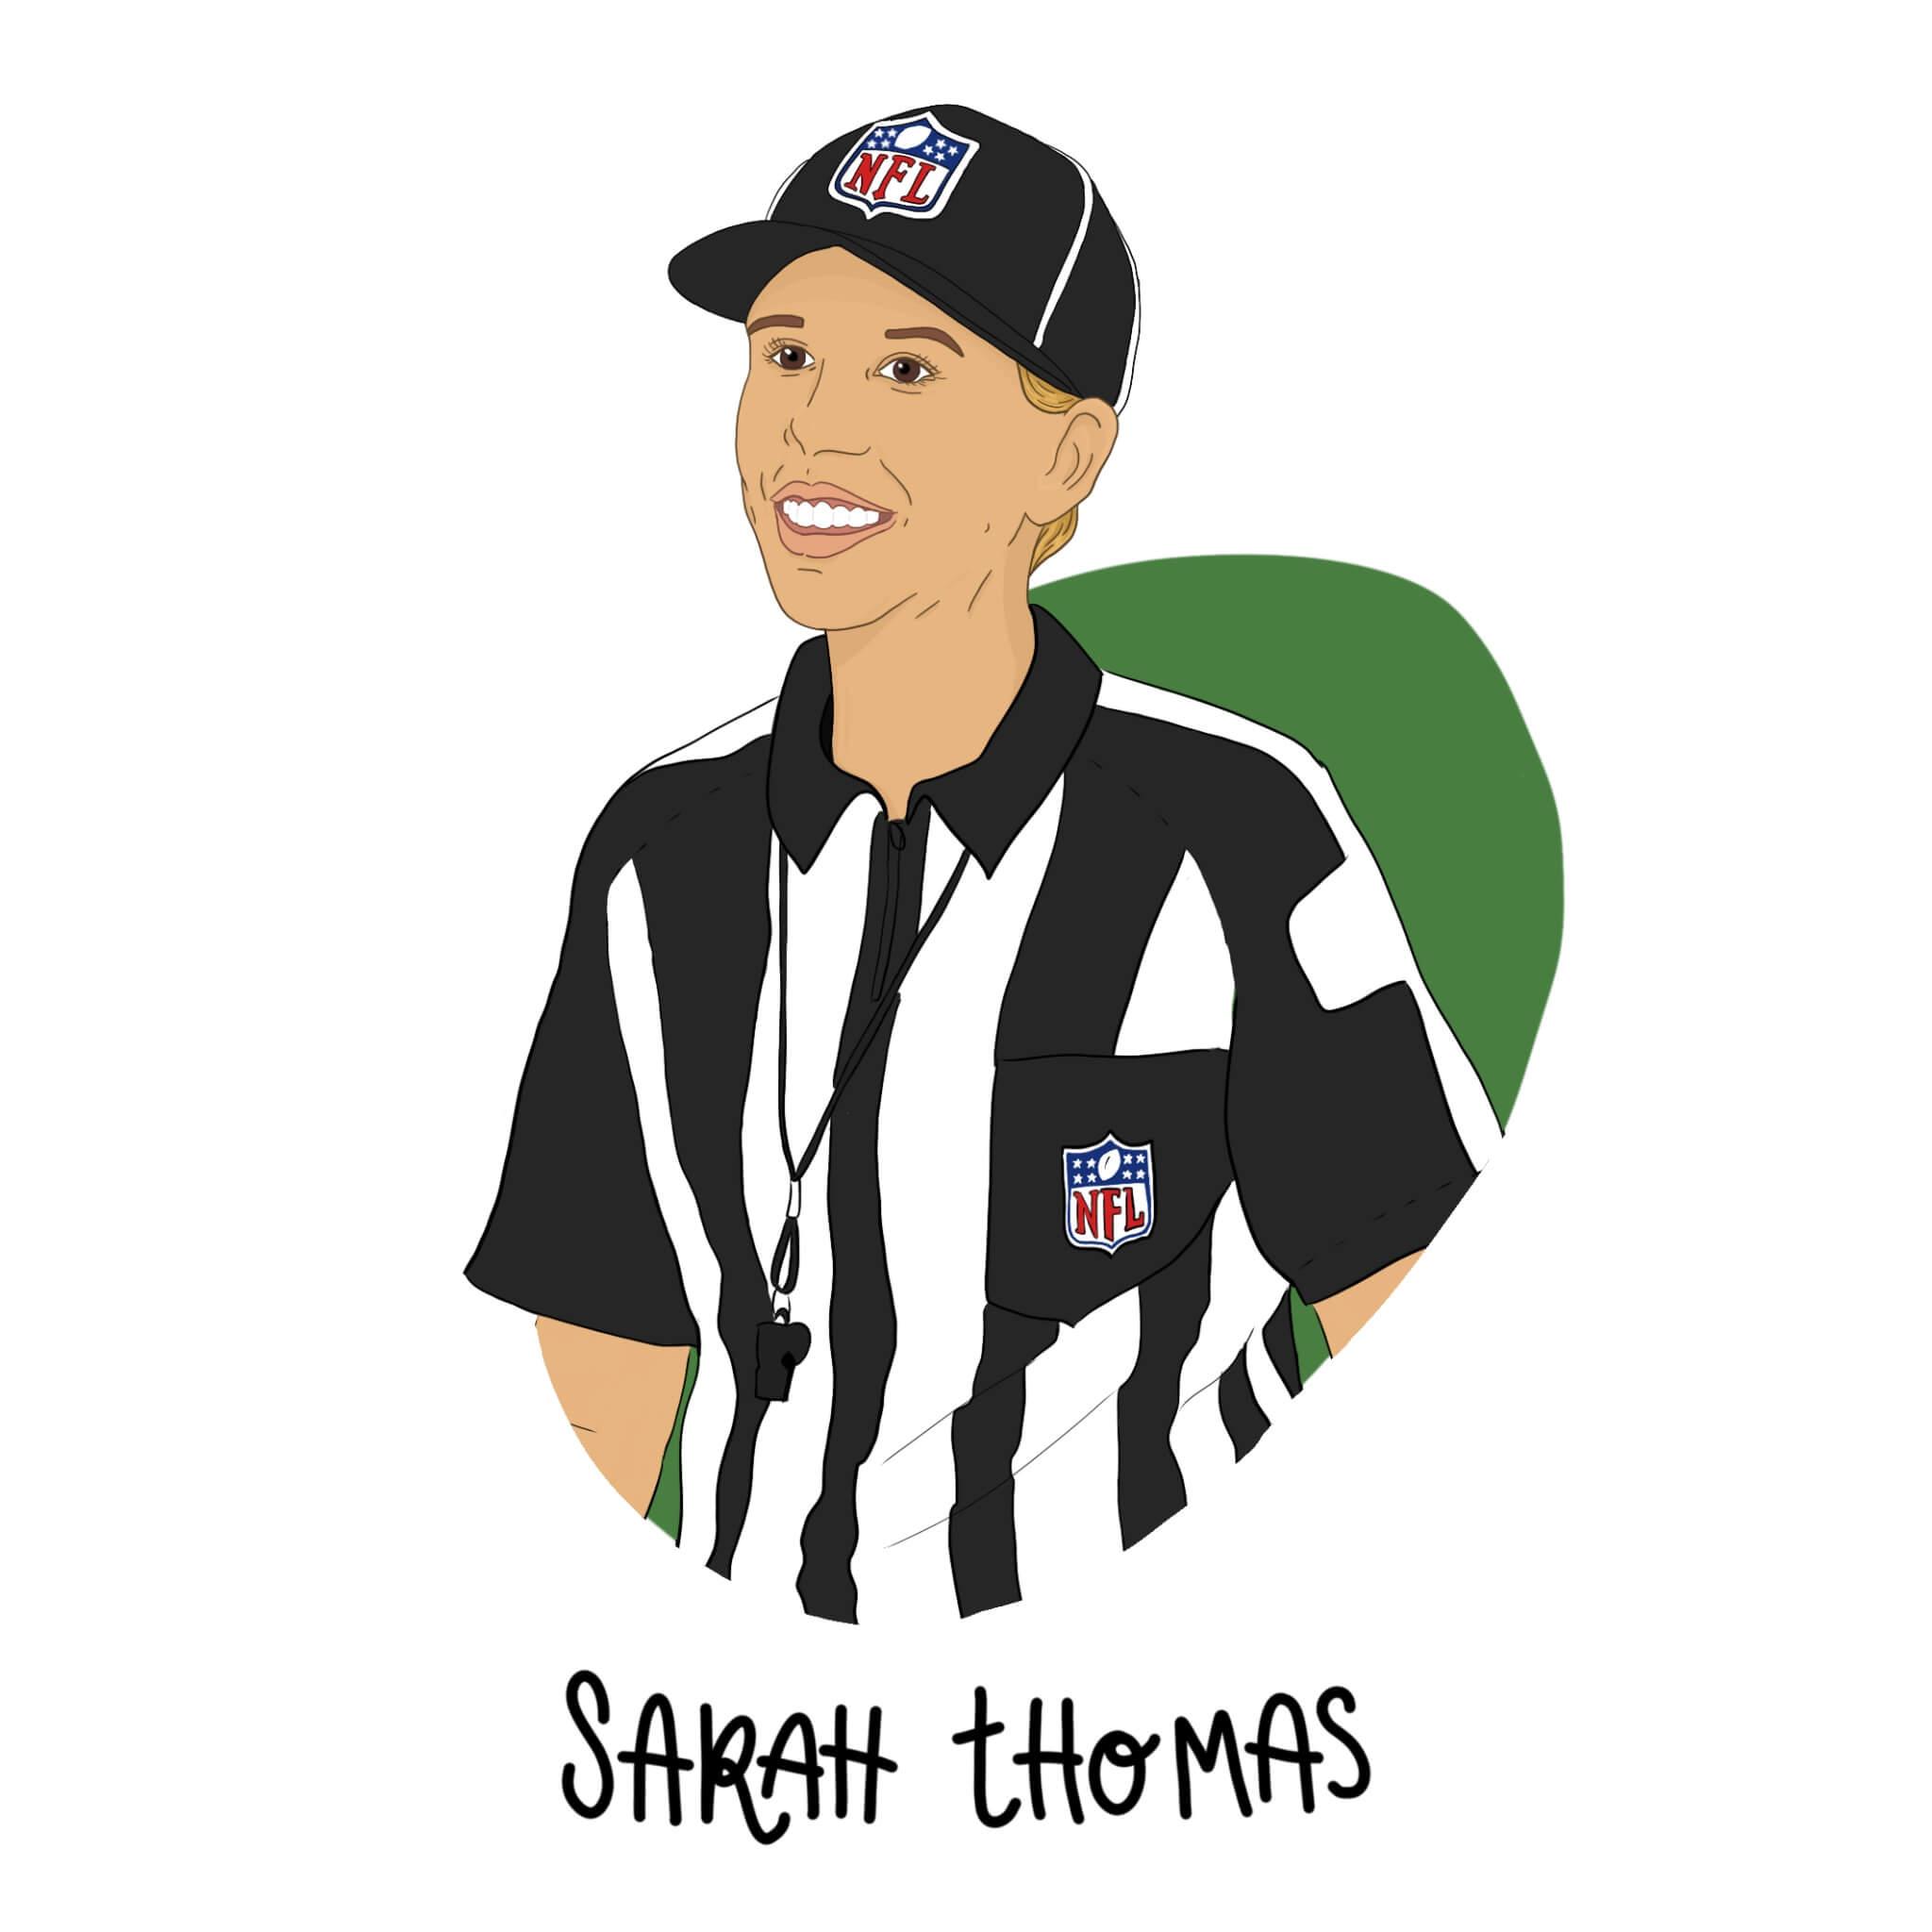 Illustration of Sarah Thomas by Jessica Ringelstein